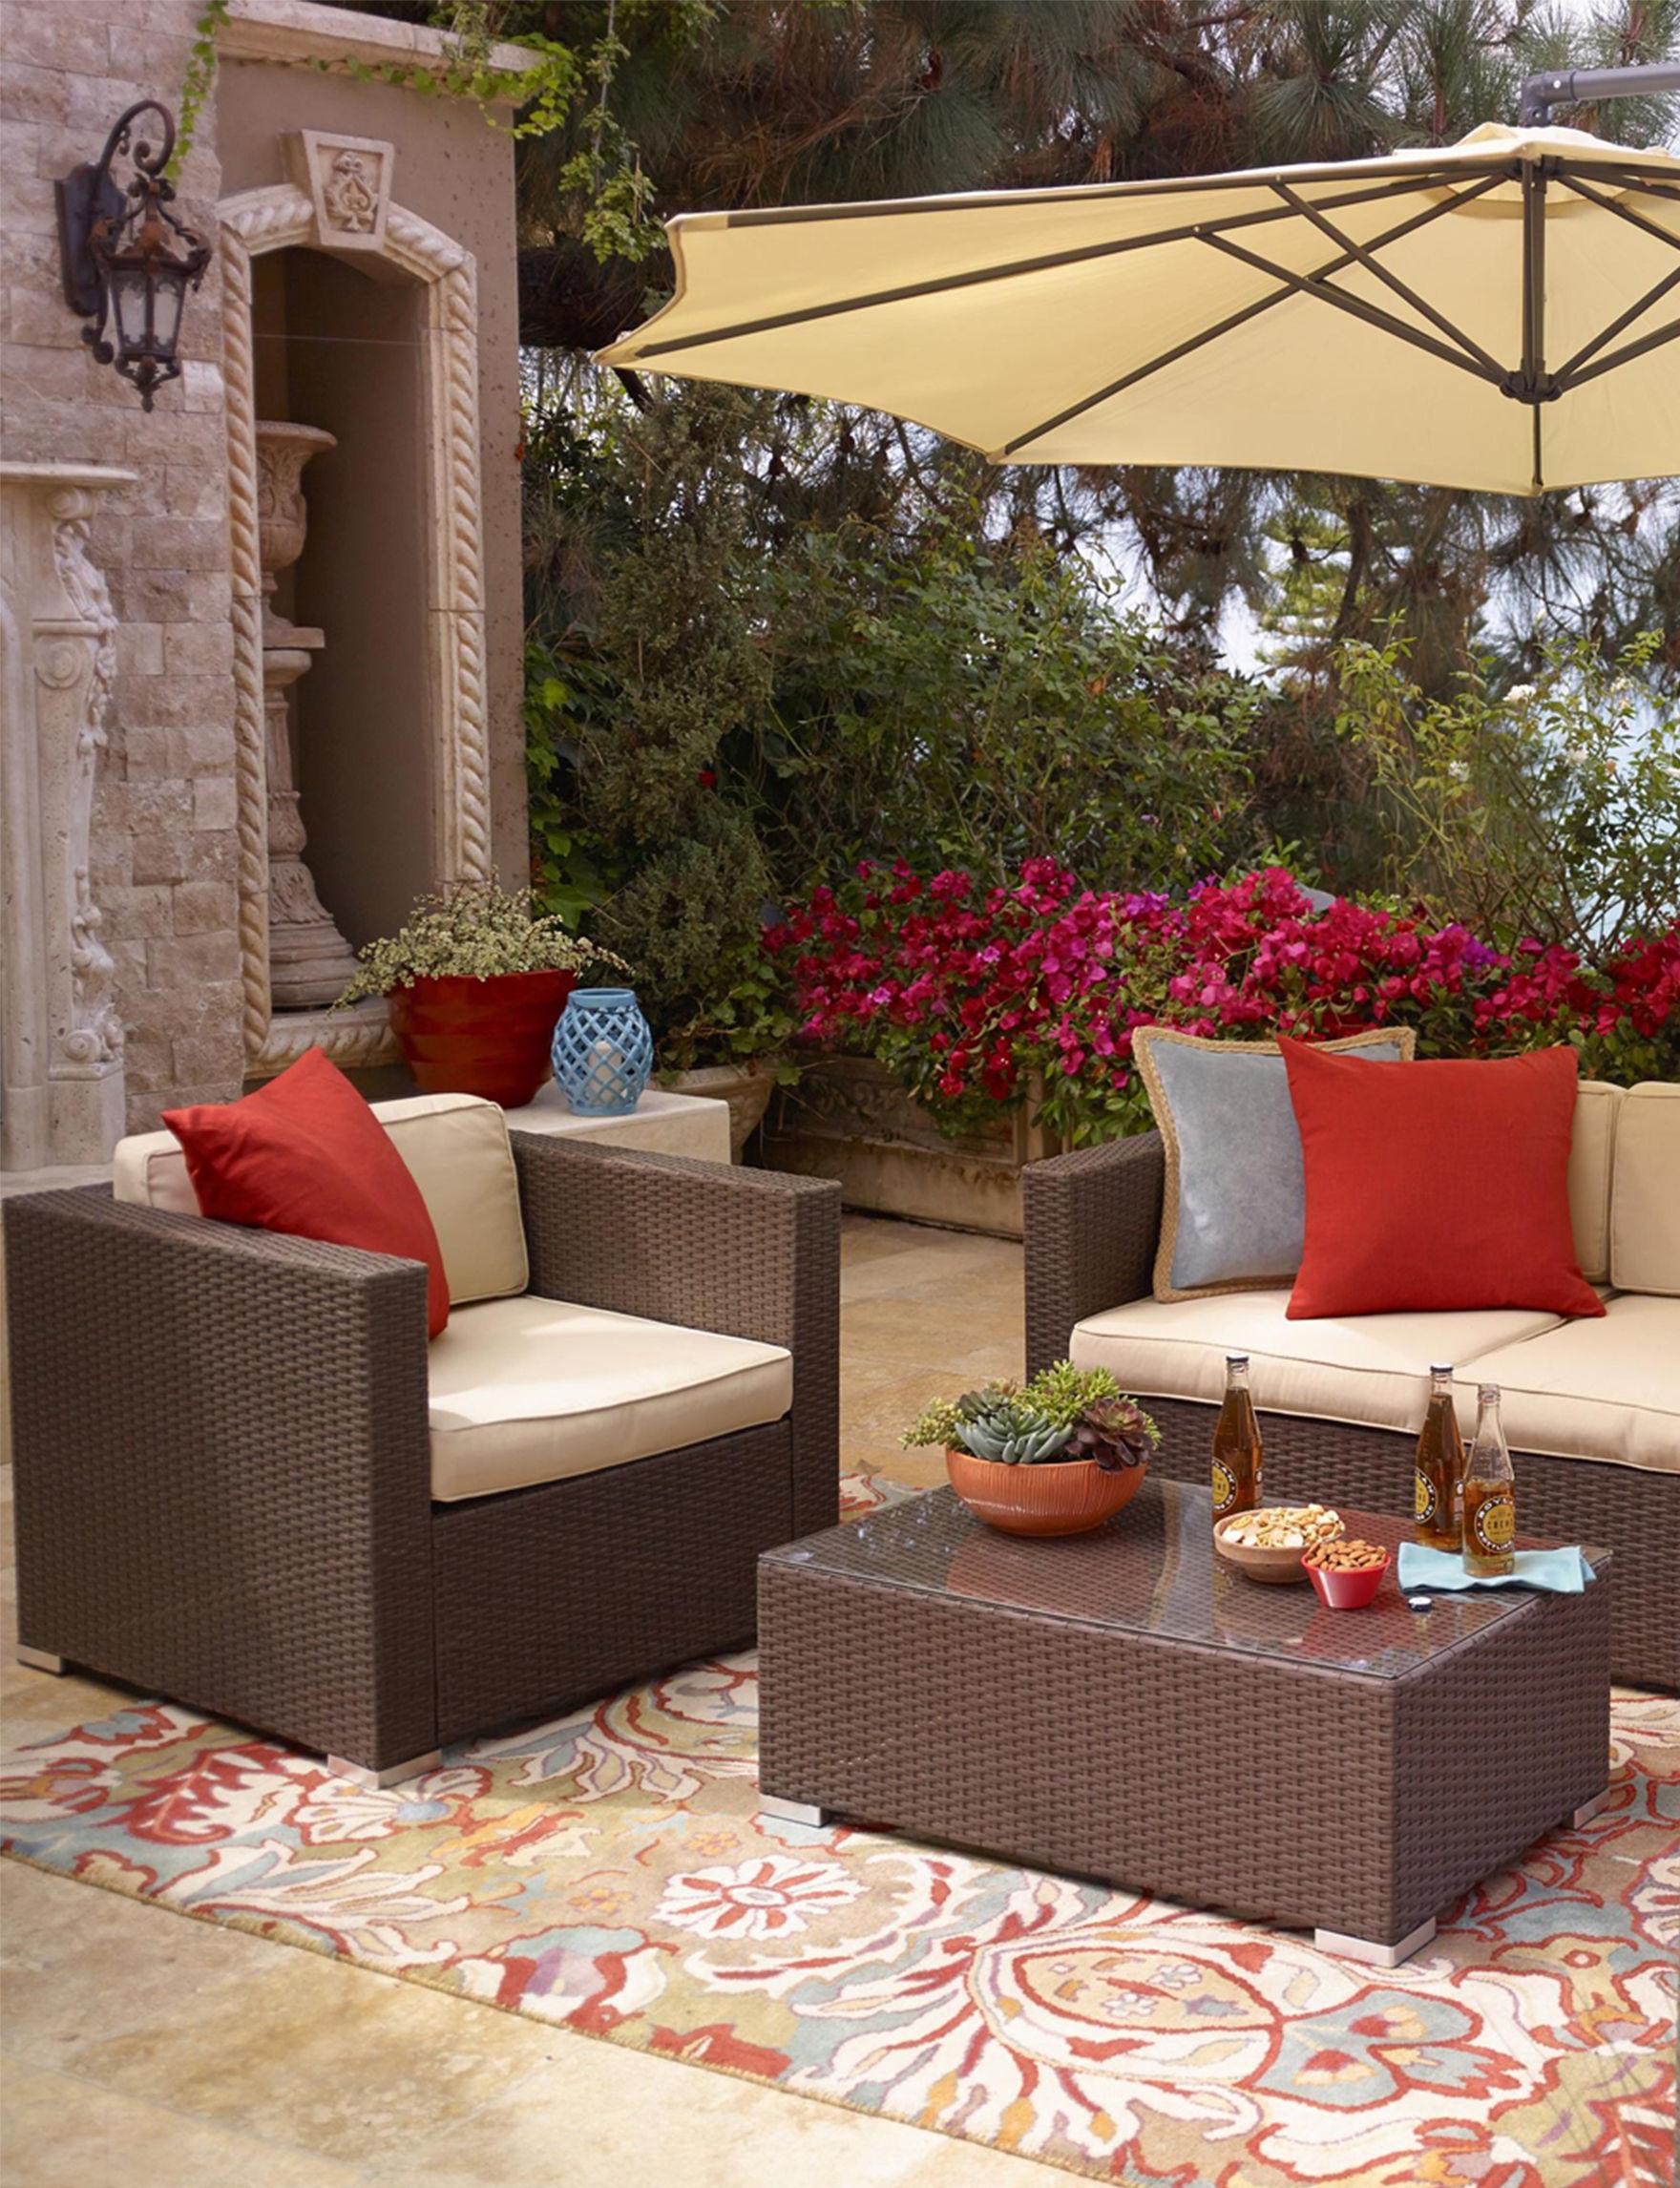 Thy hom 5 pc cane garden outdoor wicker conversation set for Hom patio furniture